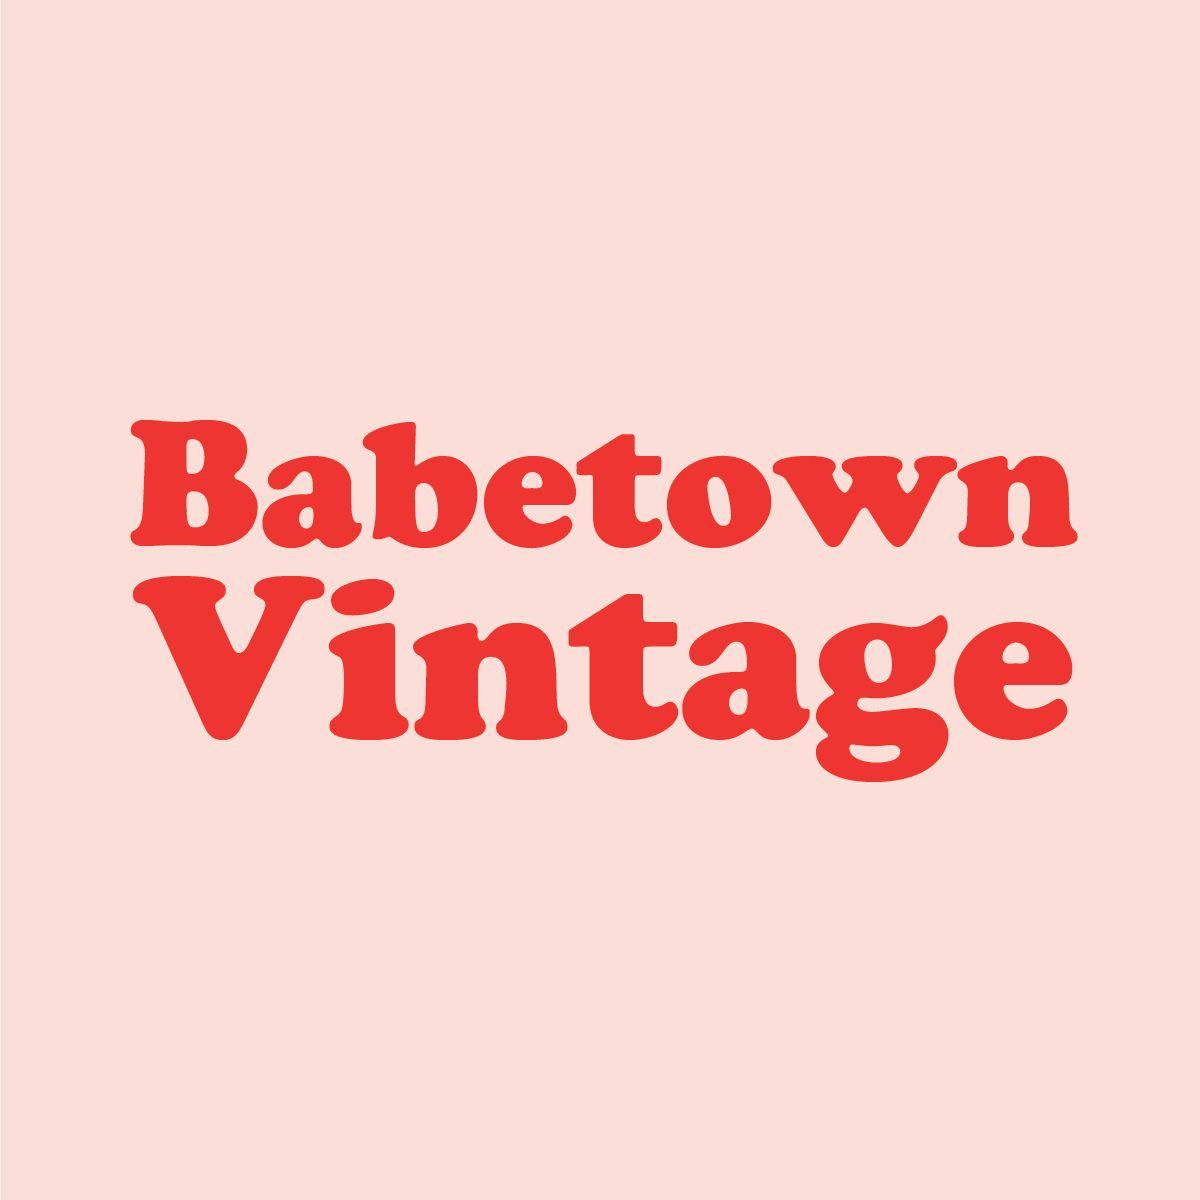 Babetownvintageatx Vintage Quotes Aesthetic Captions Quote Aesthetic